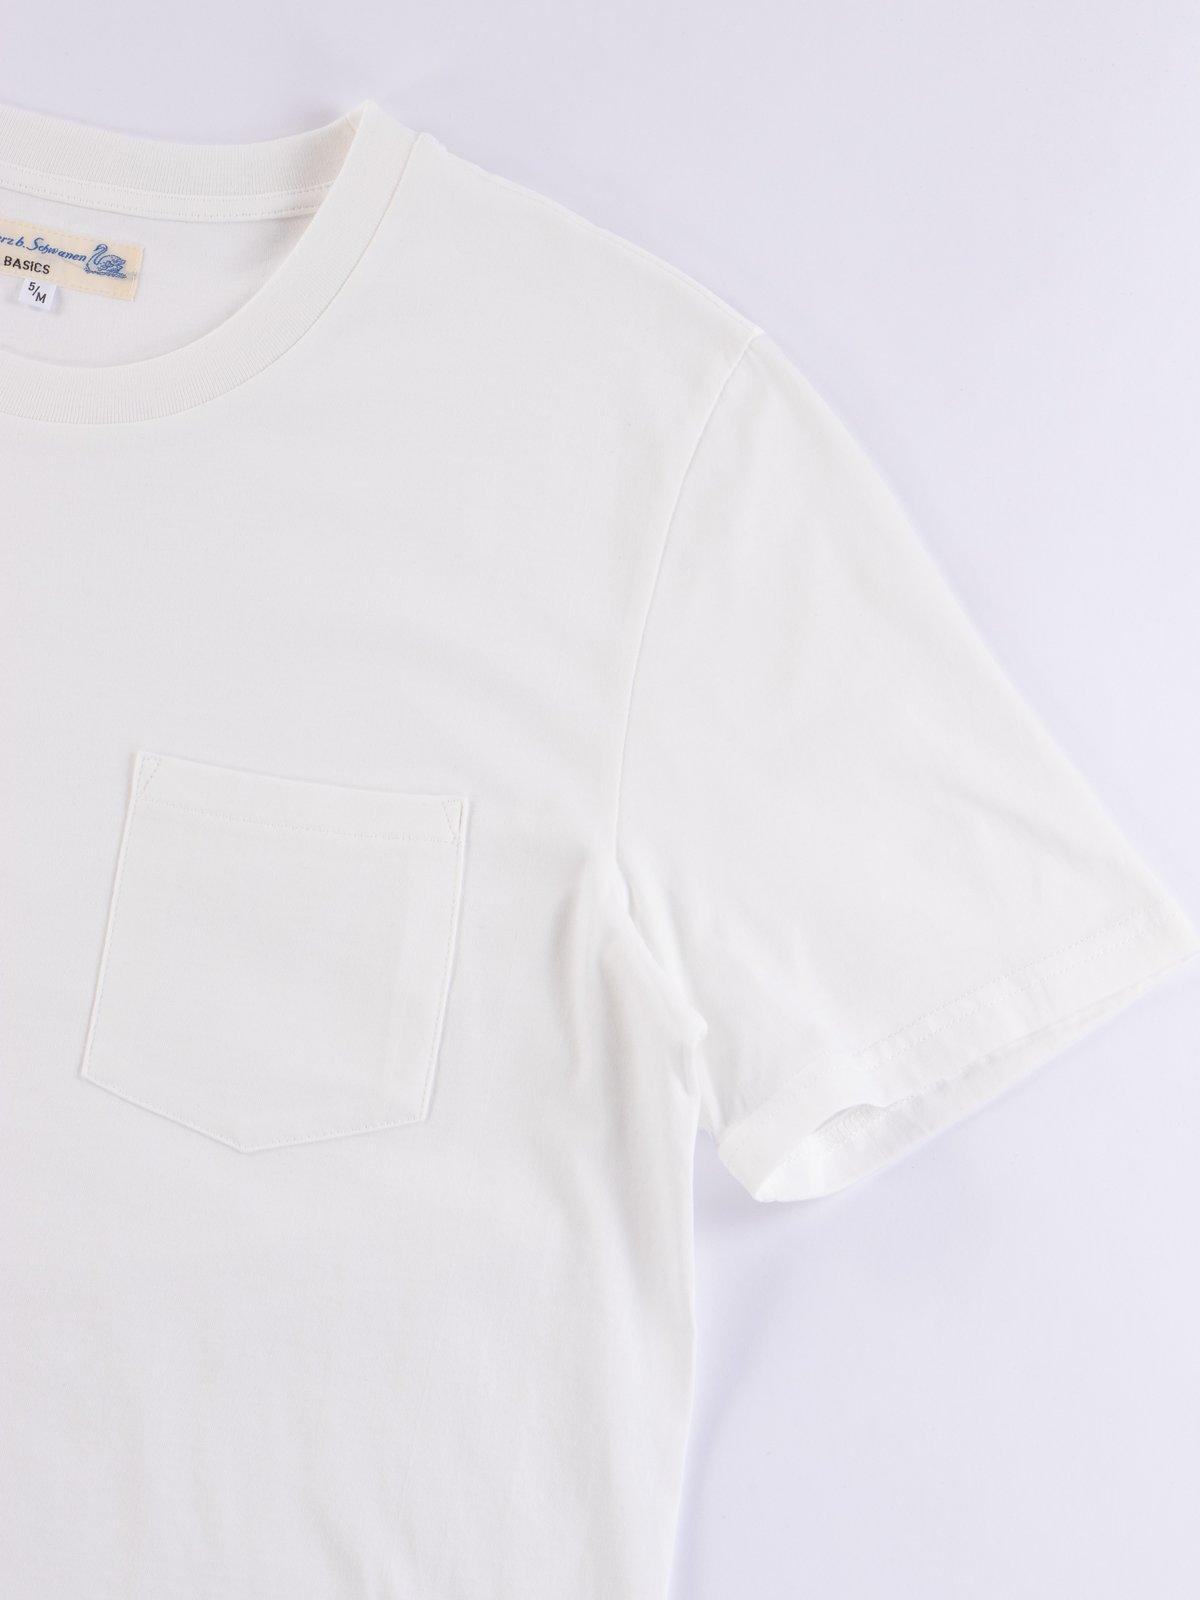 White Good Basics CTP01 Pocket Crew Neck Tee - Image 4